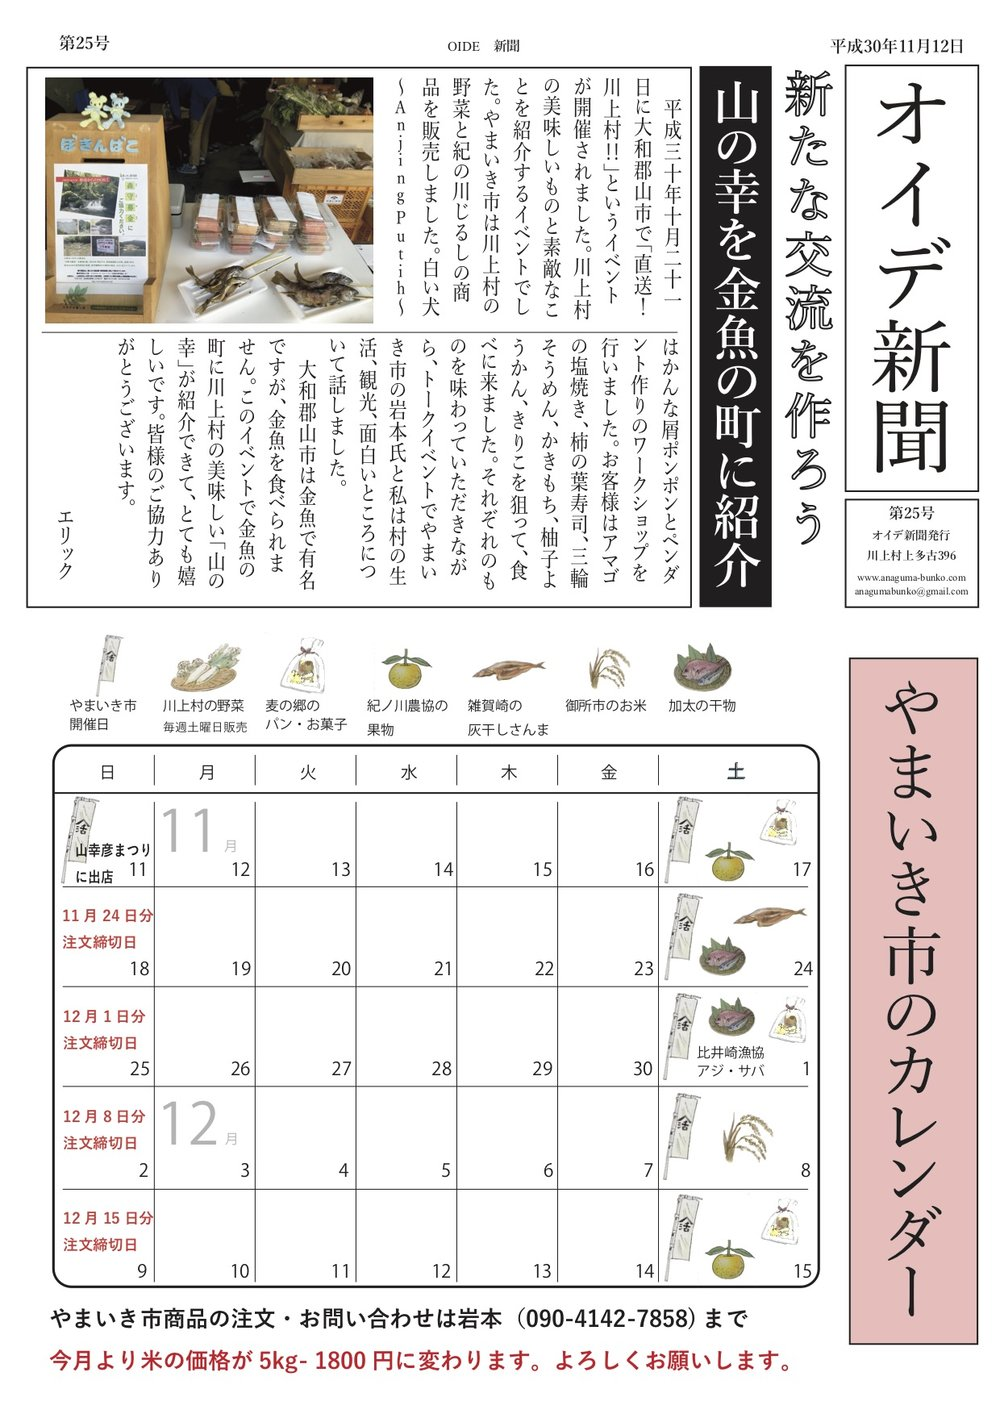 oide新聞30年11月号表.jpg